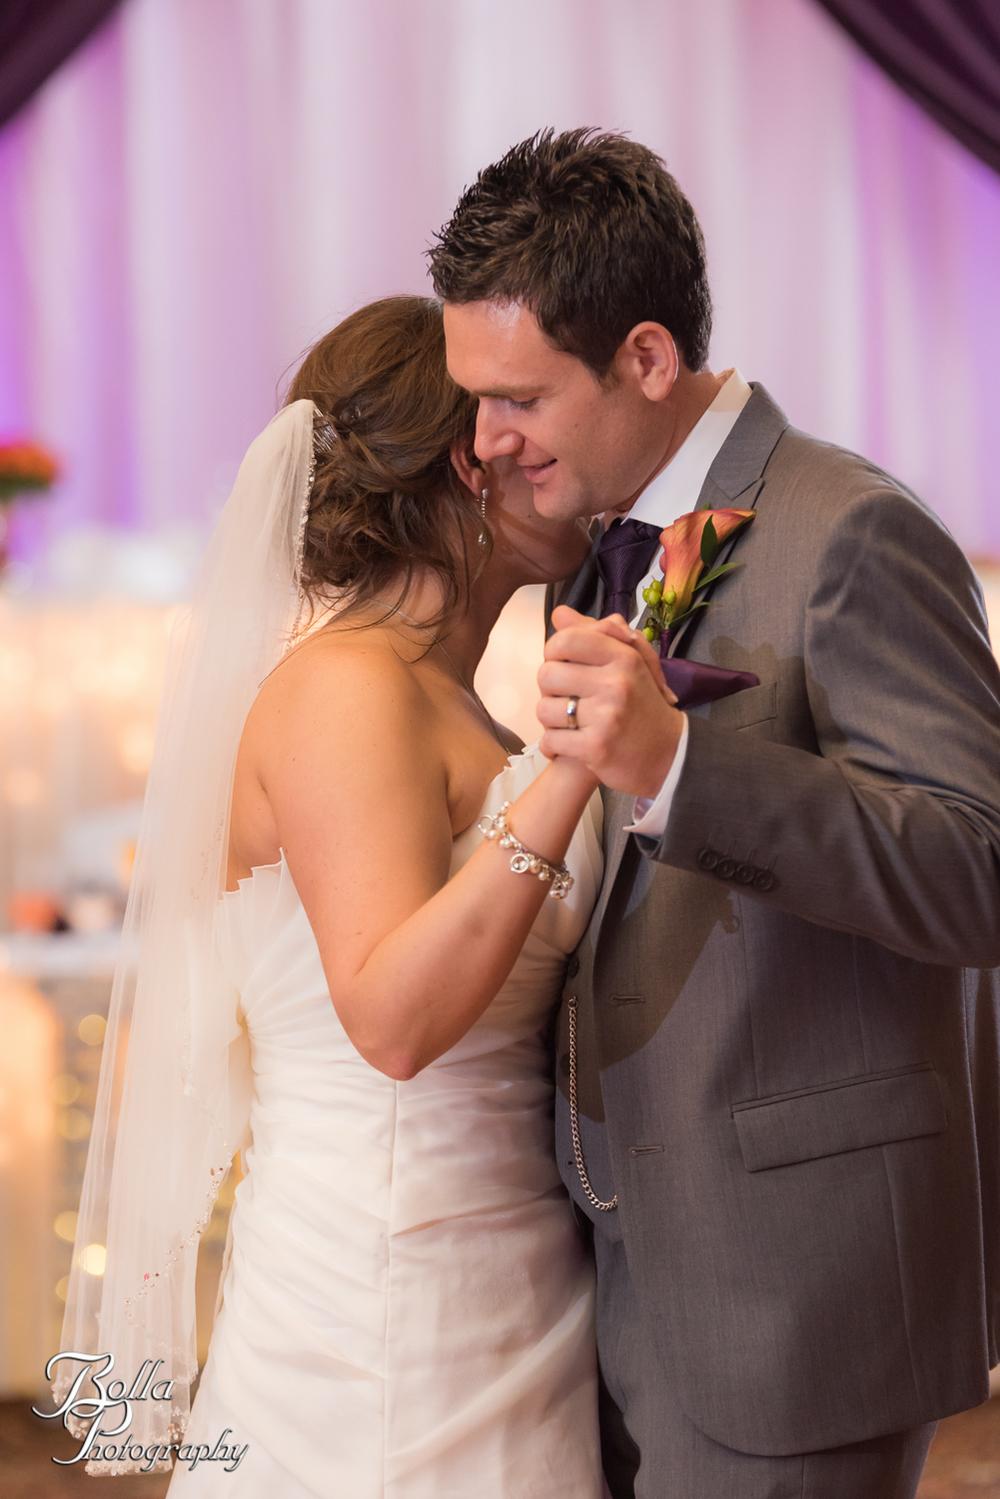 Bolla_Photography_St_Louis_wedding_photographer-0449.jpg